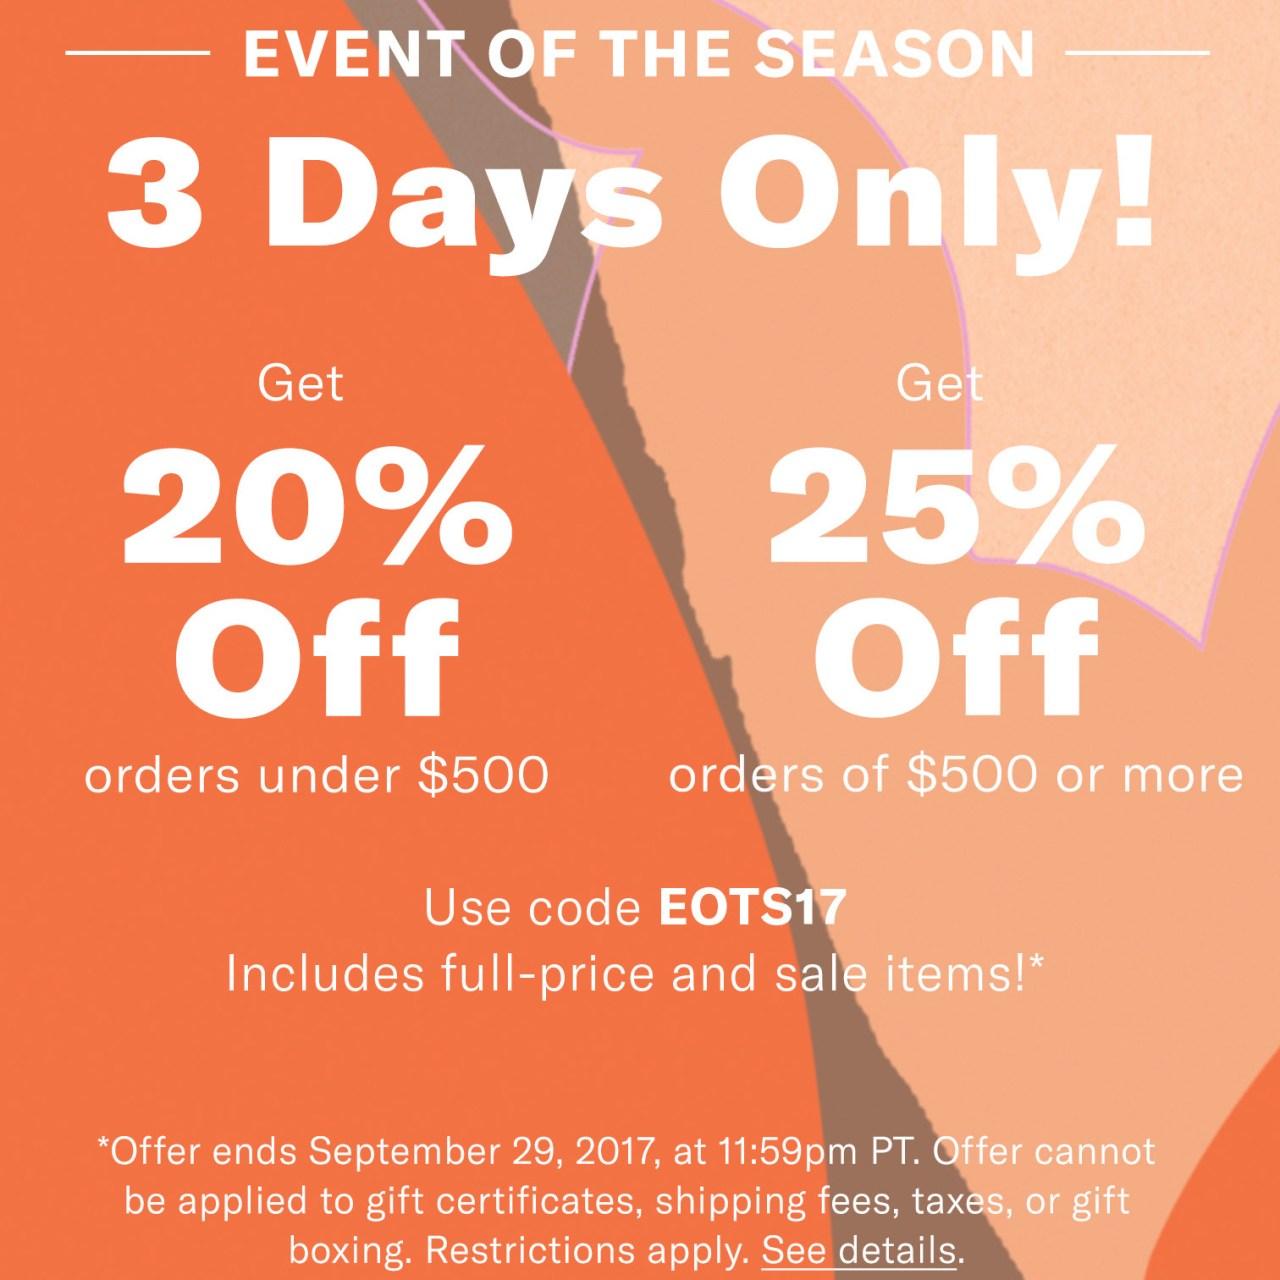 Shopbop Seasonal Event